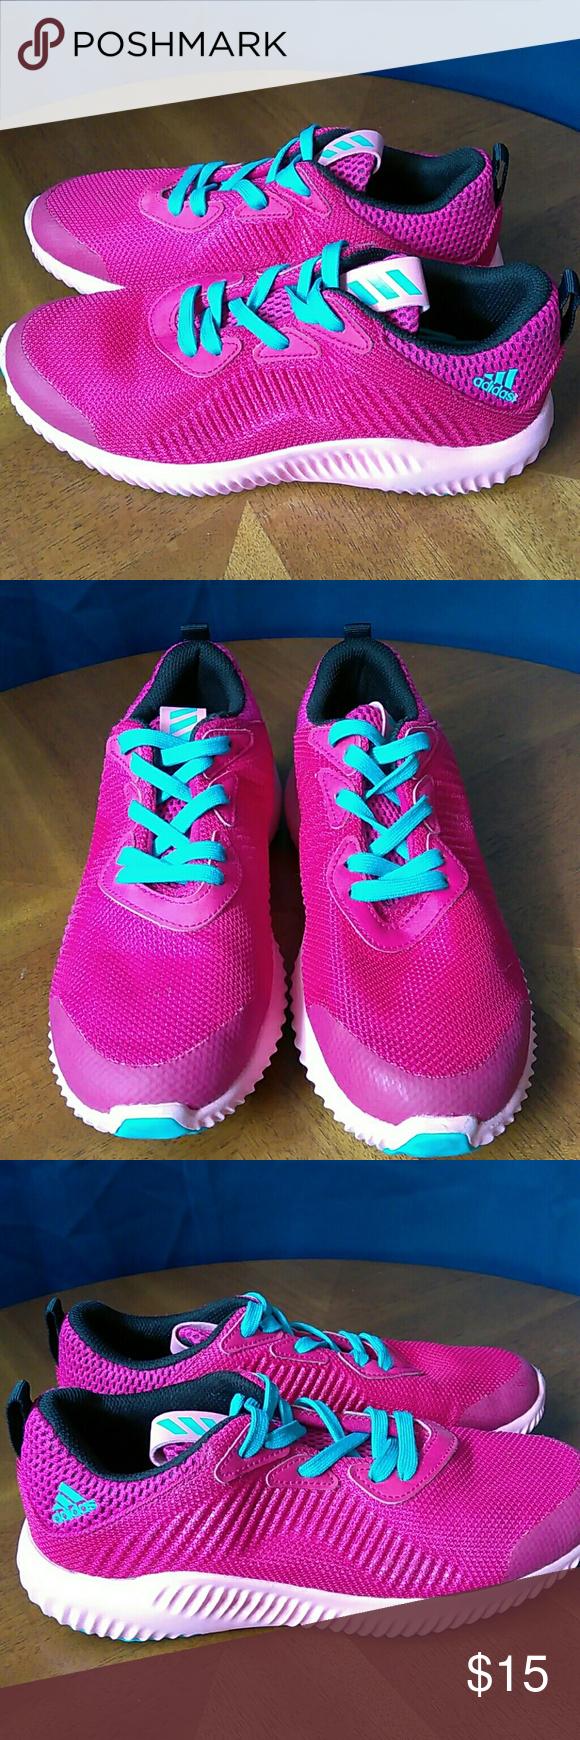 Adidas Eco Ortholite sneakers (little